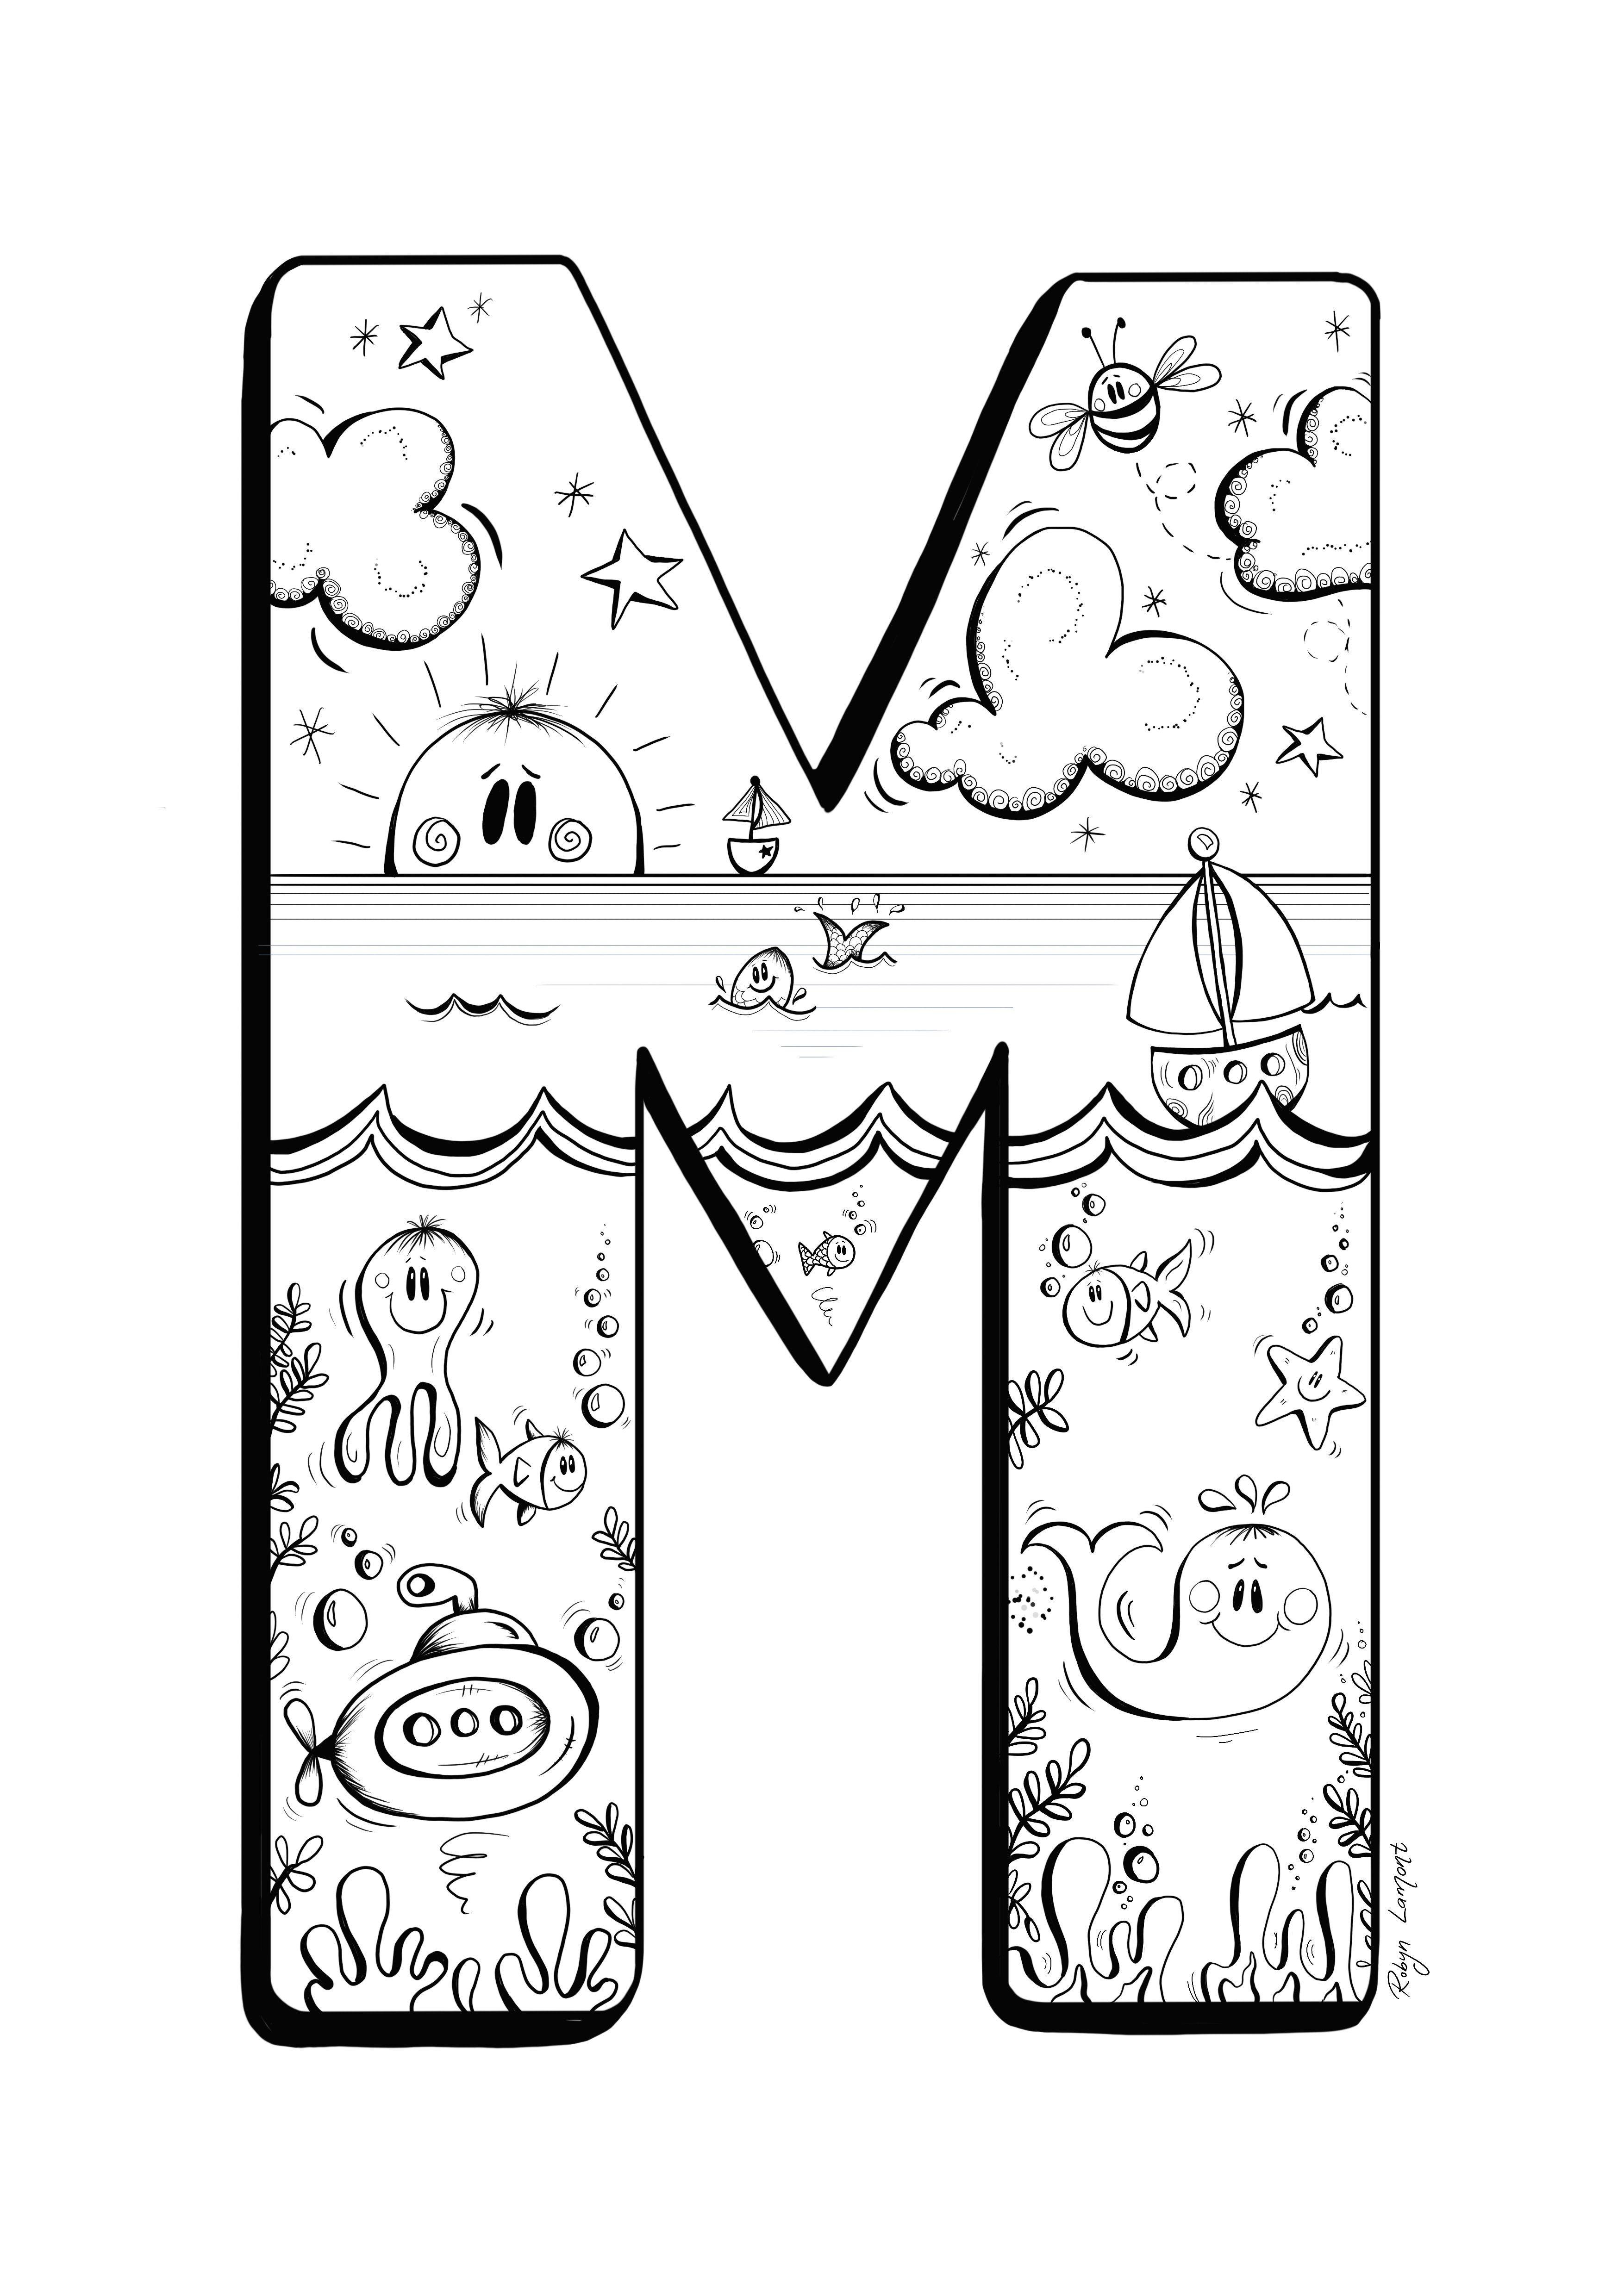 The Letter M Digital Download Monochrome Alphabet Art Print Children S Room Illustration Black And Alphabet Art Print Lettering Alphabet Illustration